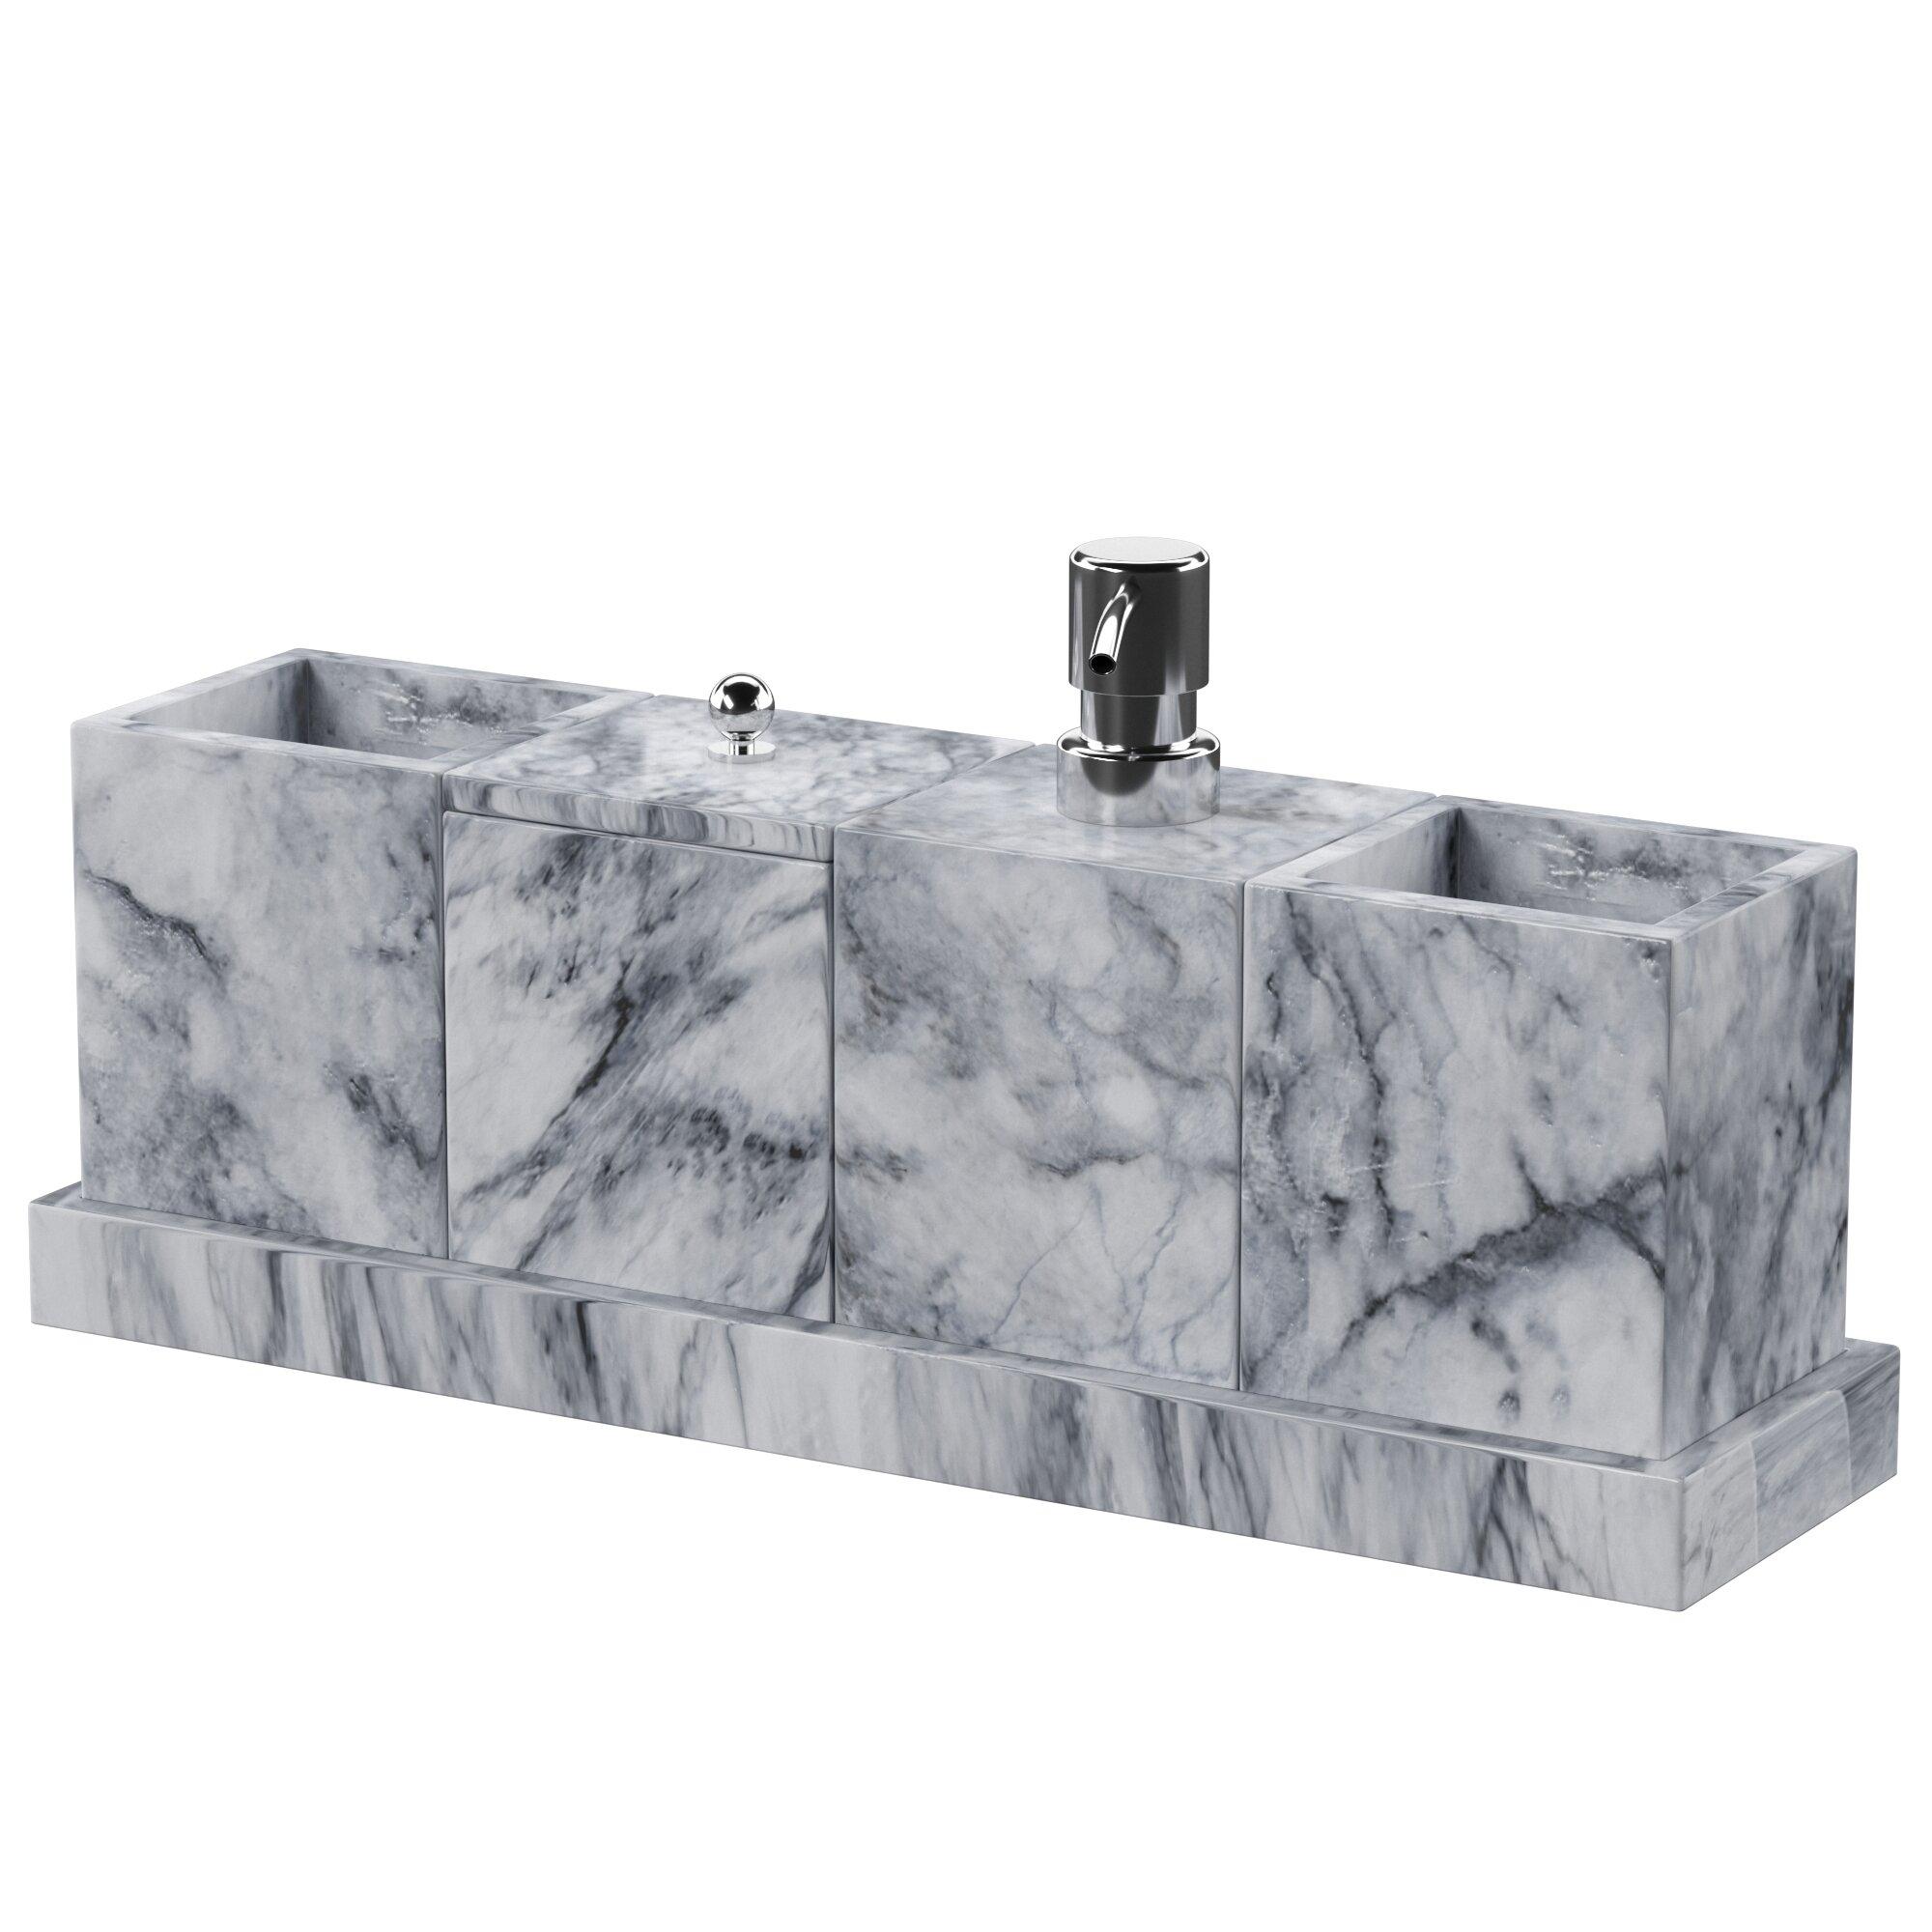 North Point 5 Piece Bathroom Accessory Set Reviews Allmodern